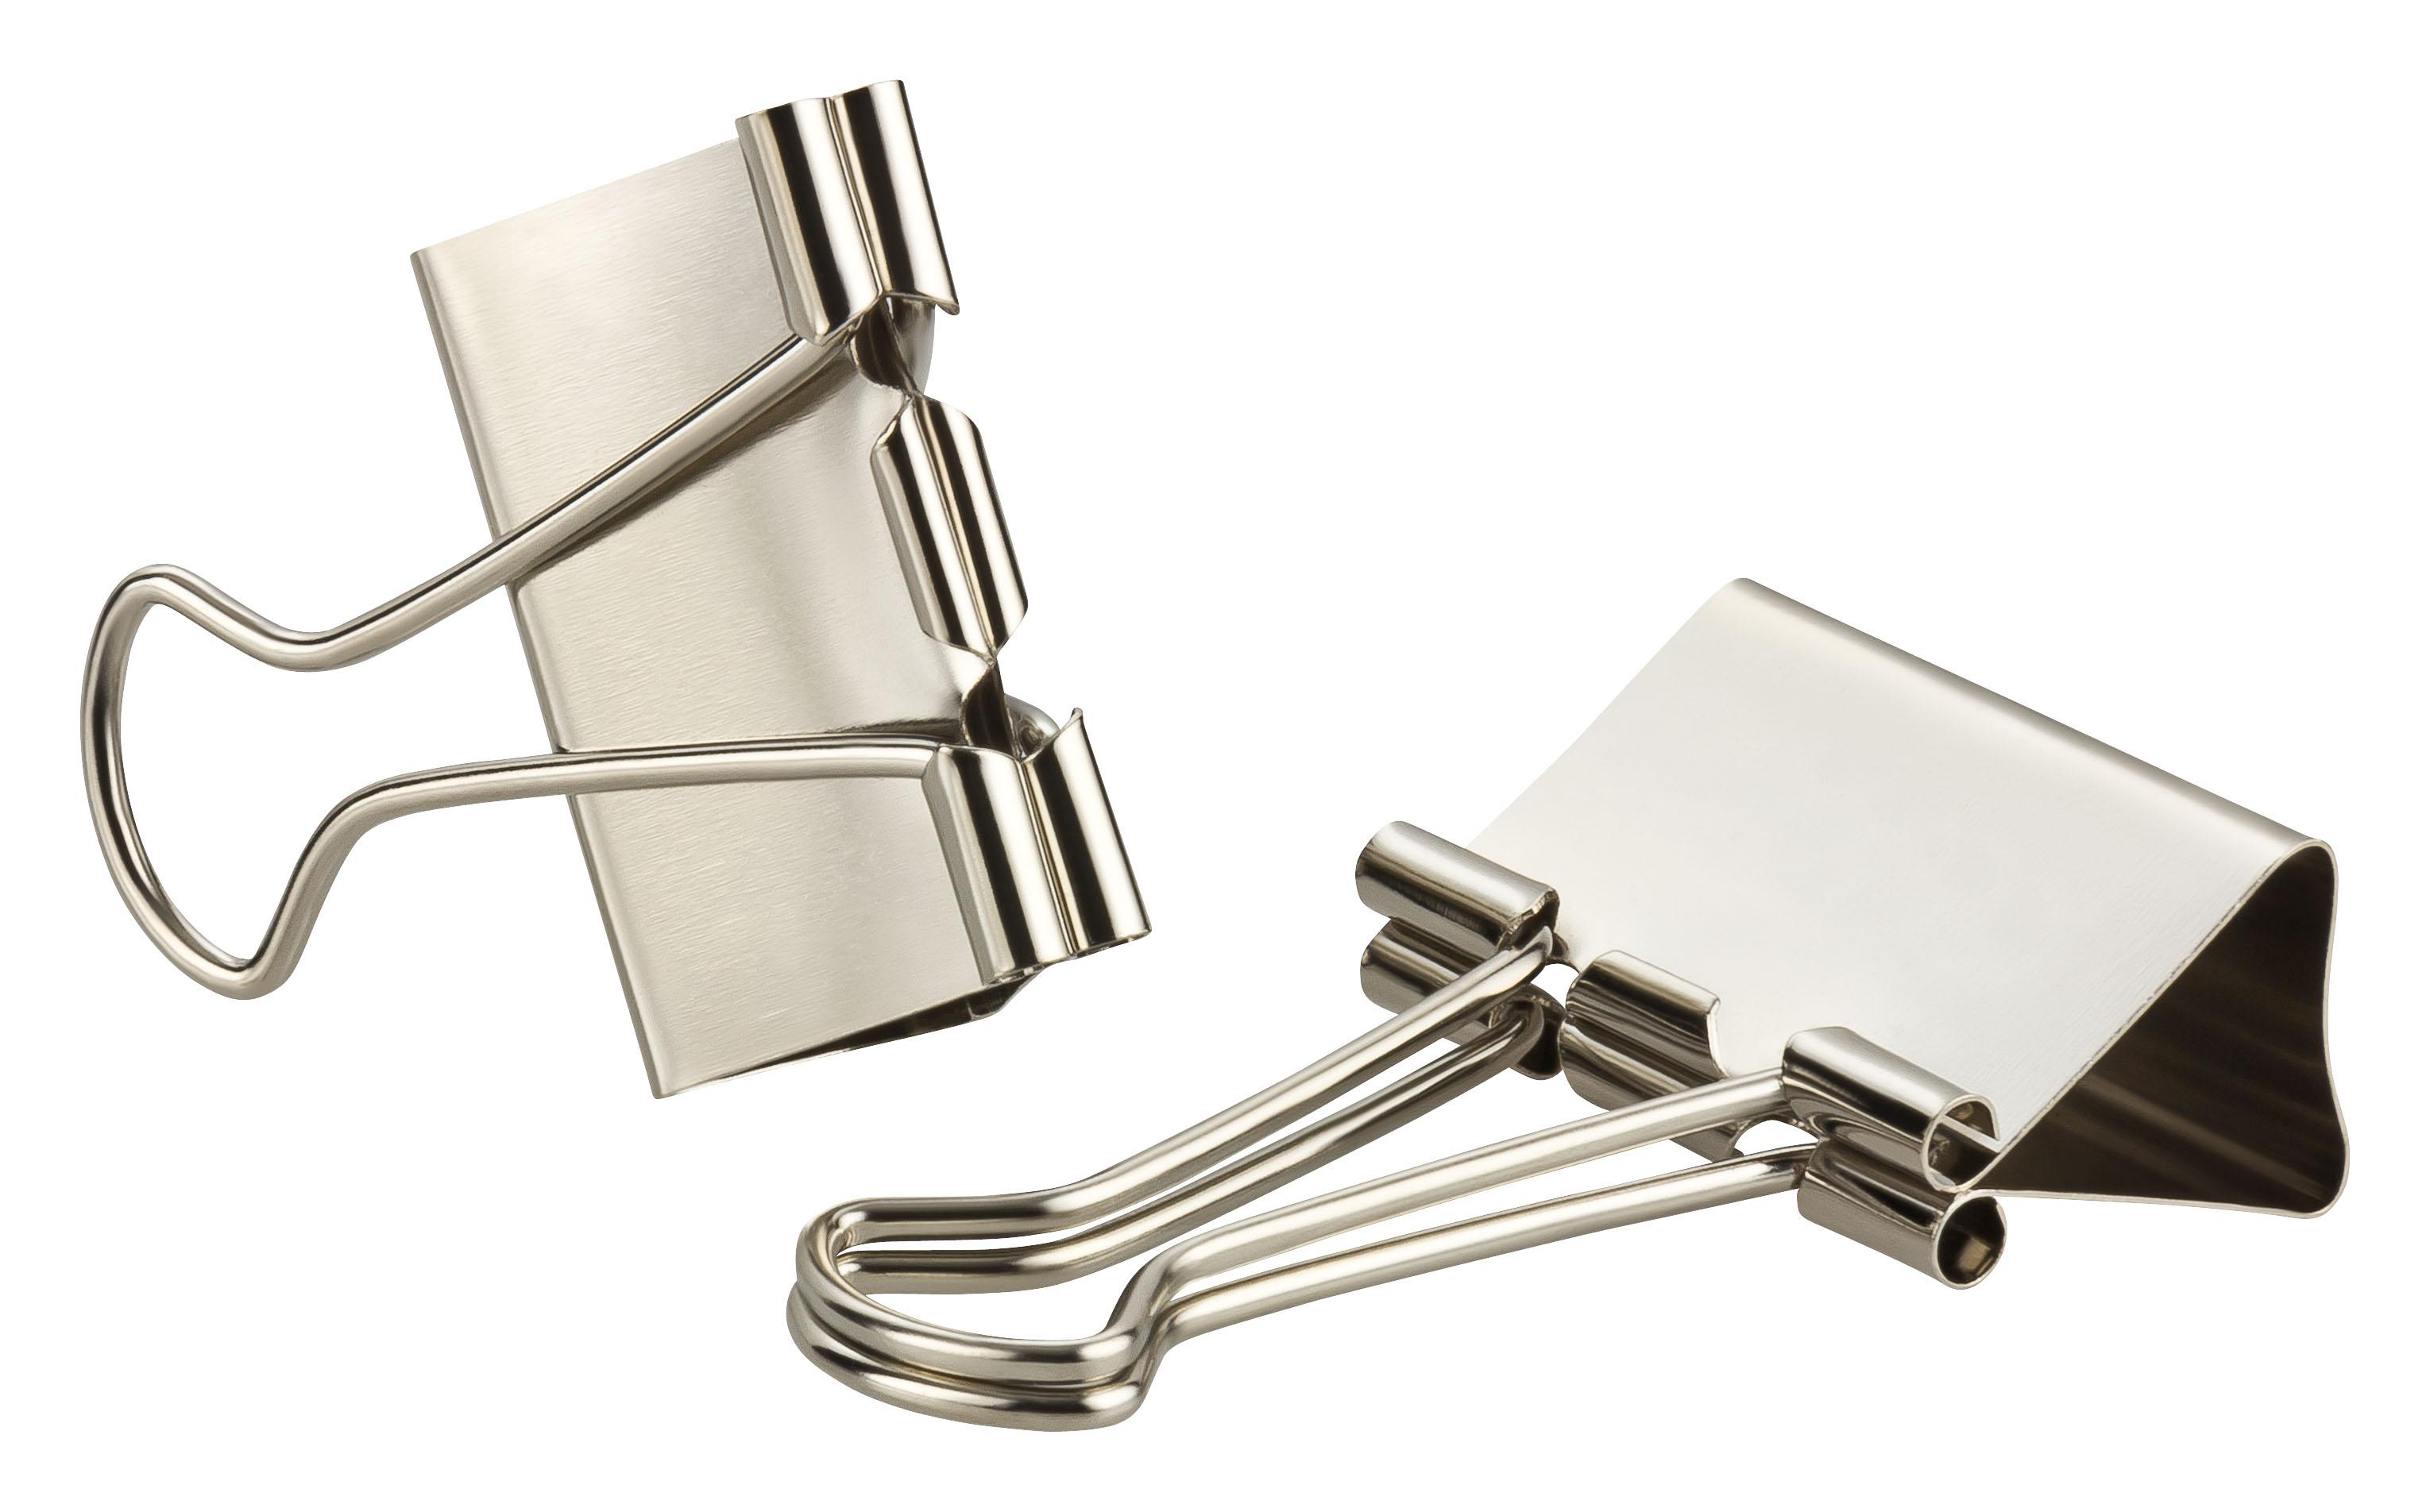 metall clip kerzengiessen. Black Bedroom Furniture Sets. Home Design Ideas